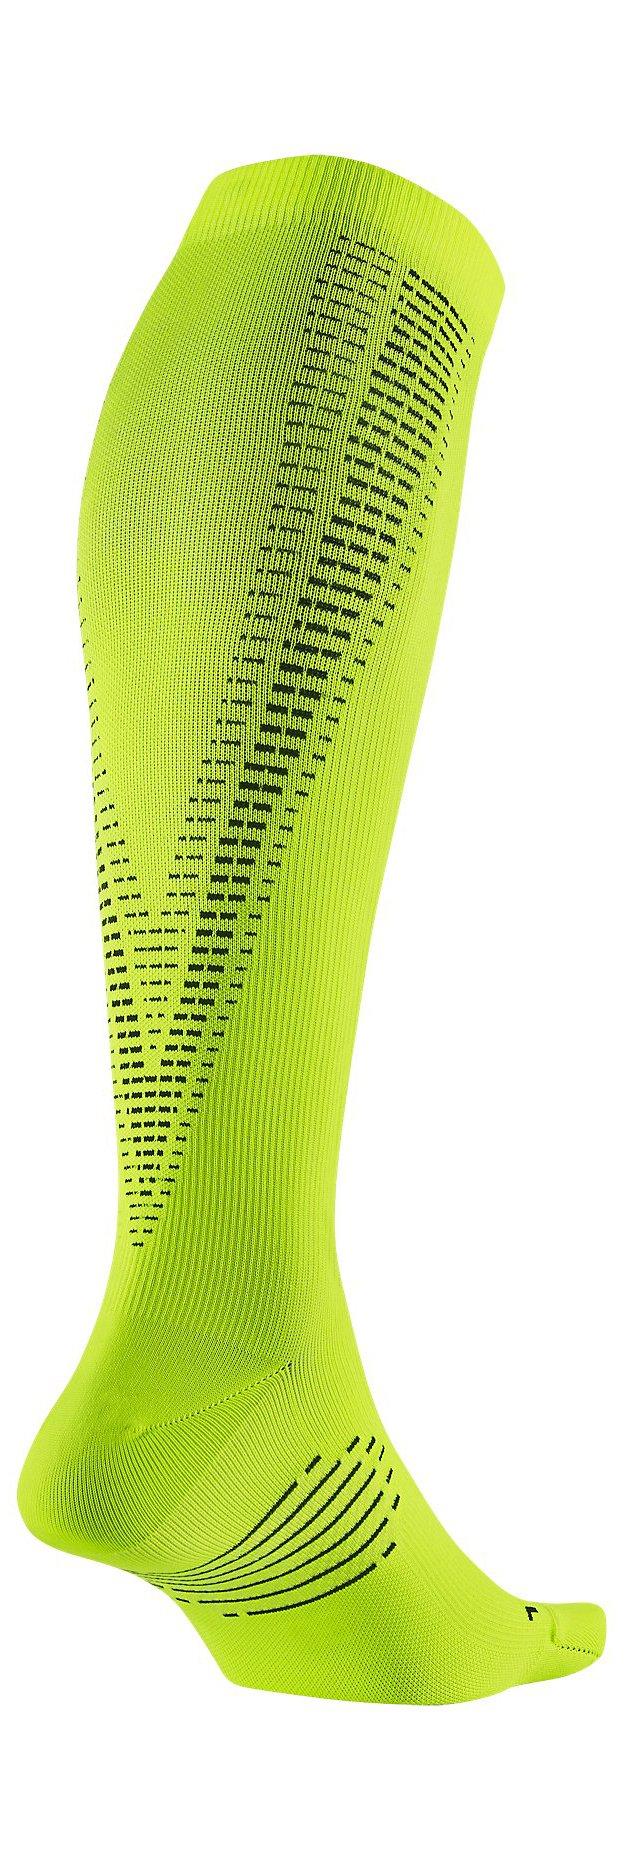 Kompresní podkolenky Nike Elite Lightweight